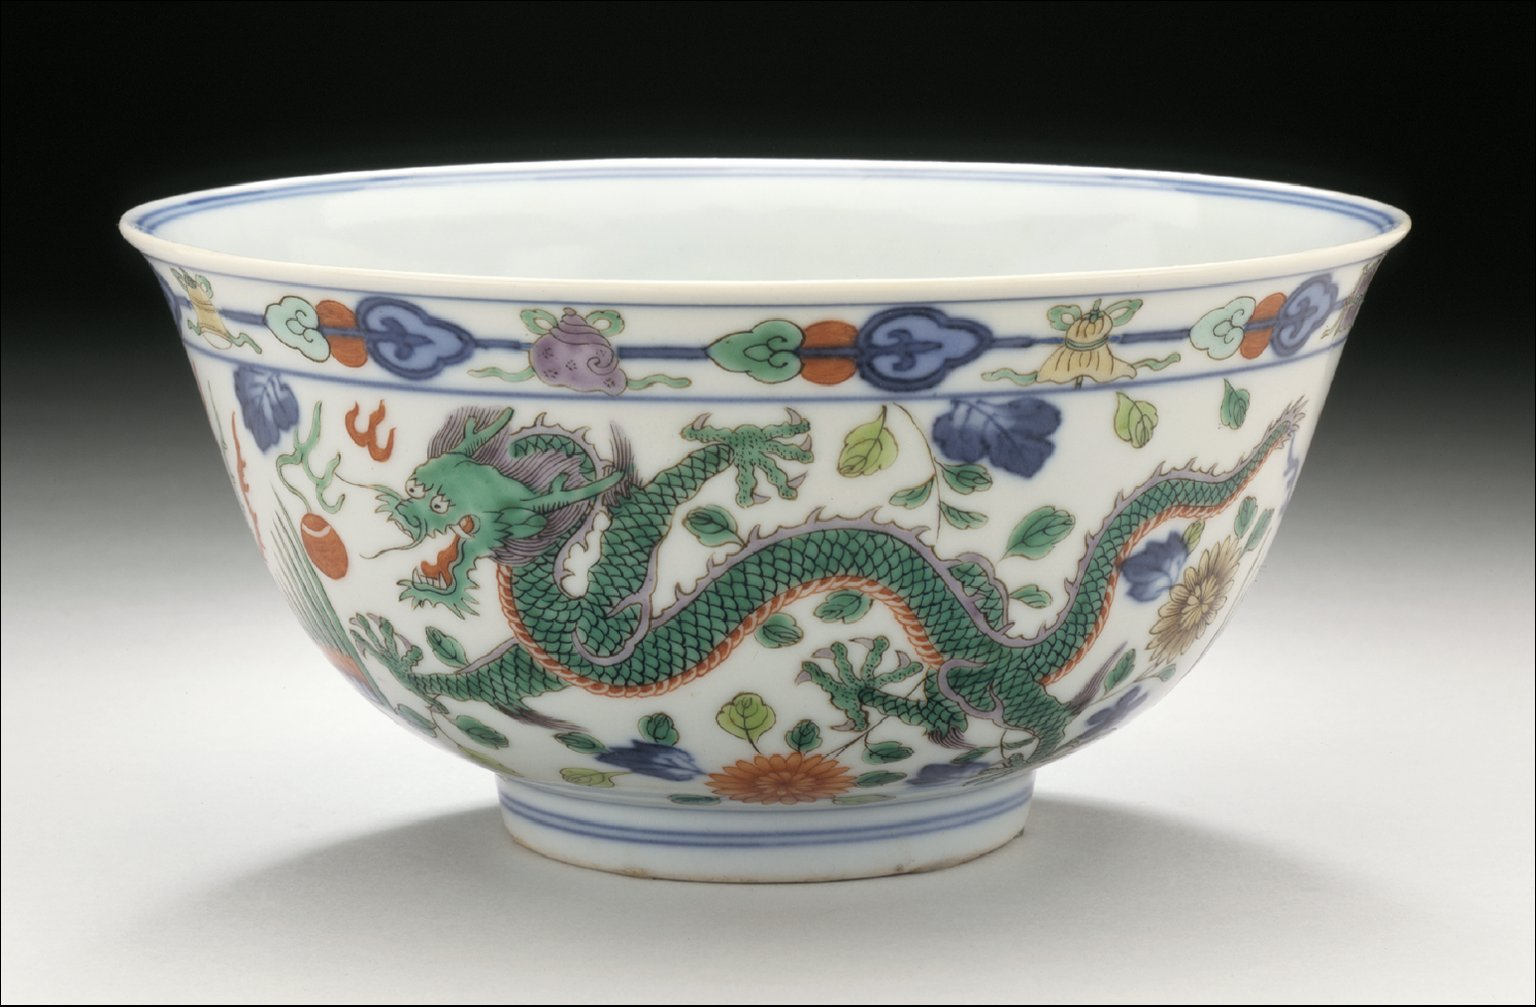 Bowl (Wan) with Dragon Chasing Flaming Pearl